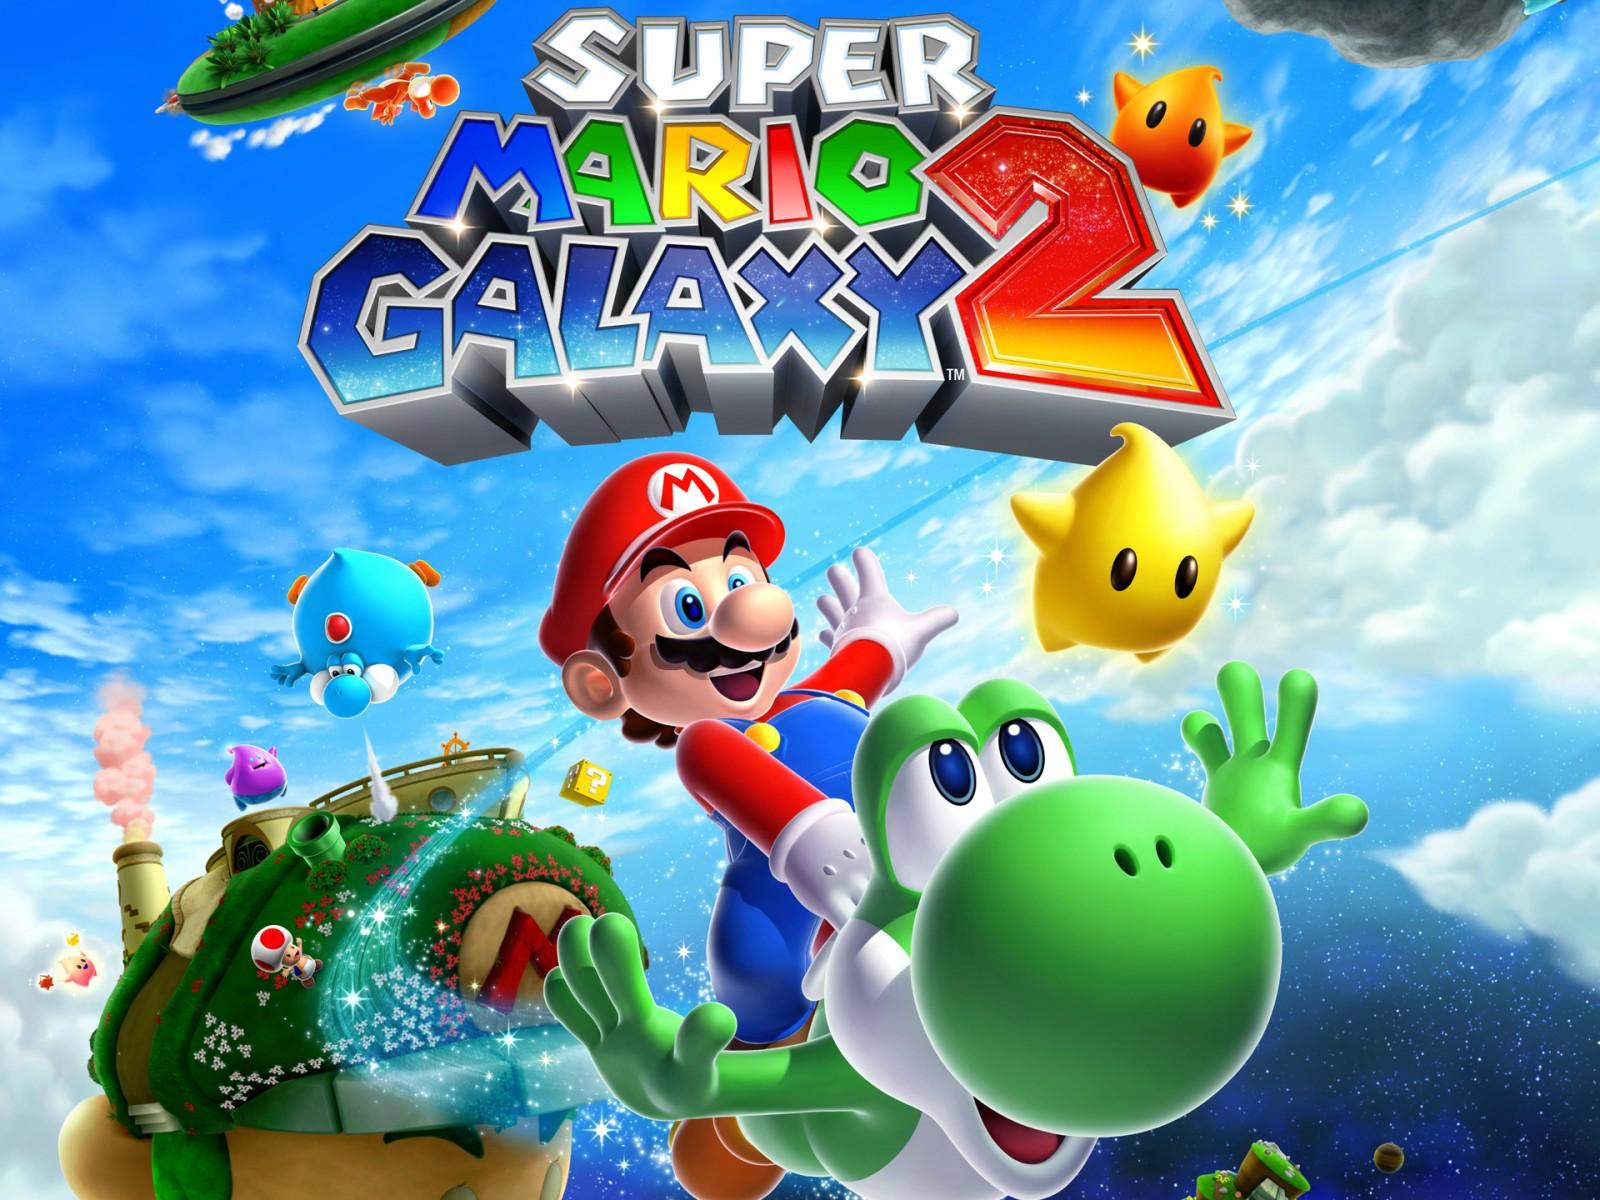 Super Mario Galaxy 2 Wallpapers HD Wallpapers ID 8671